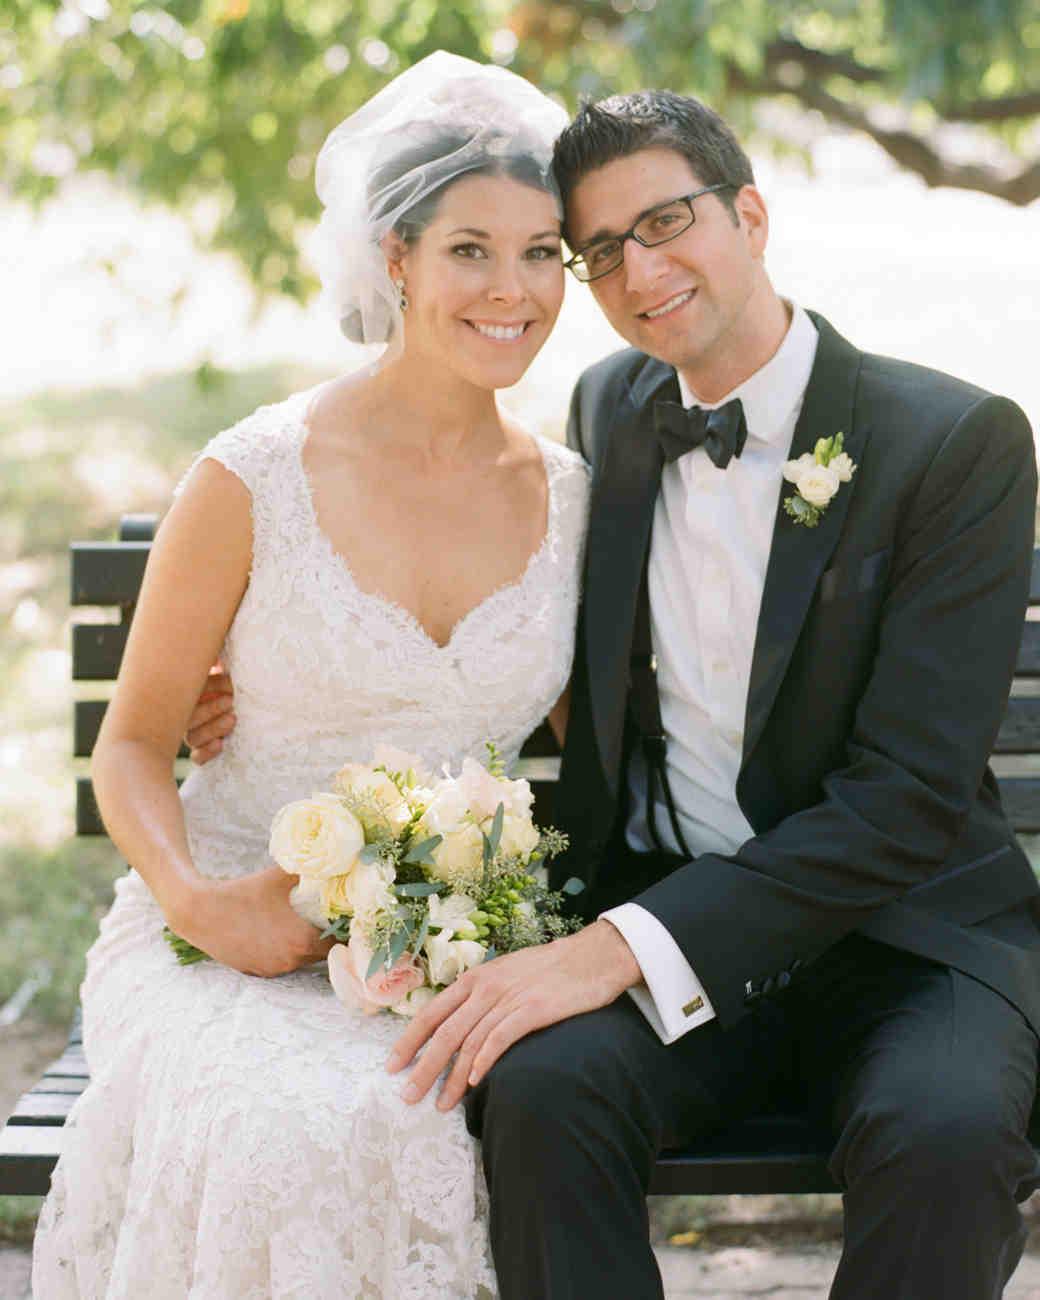 Rhett and jennifer wedding